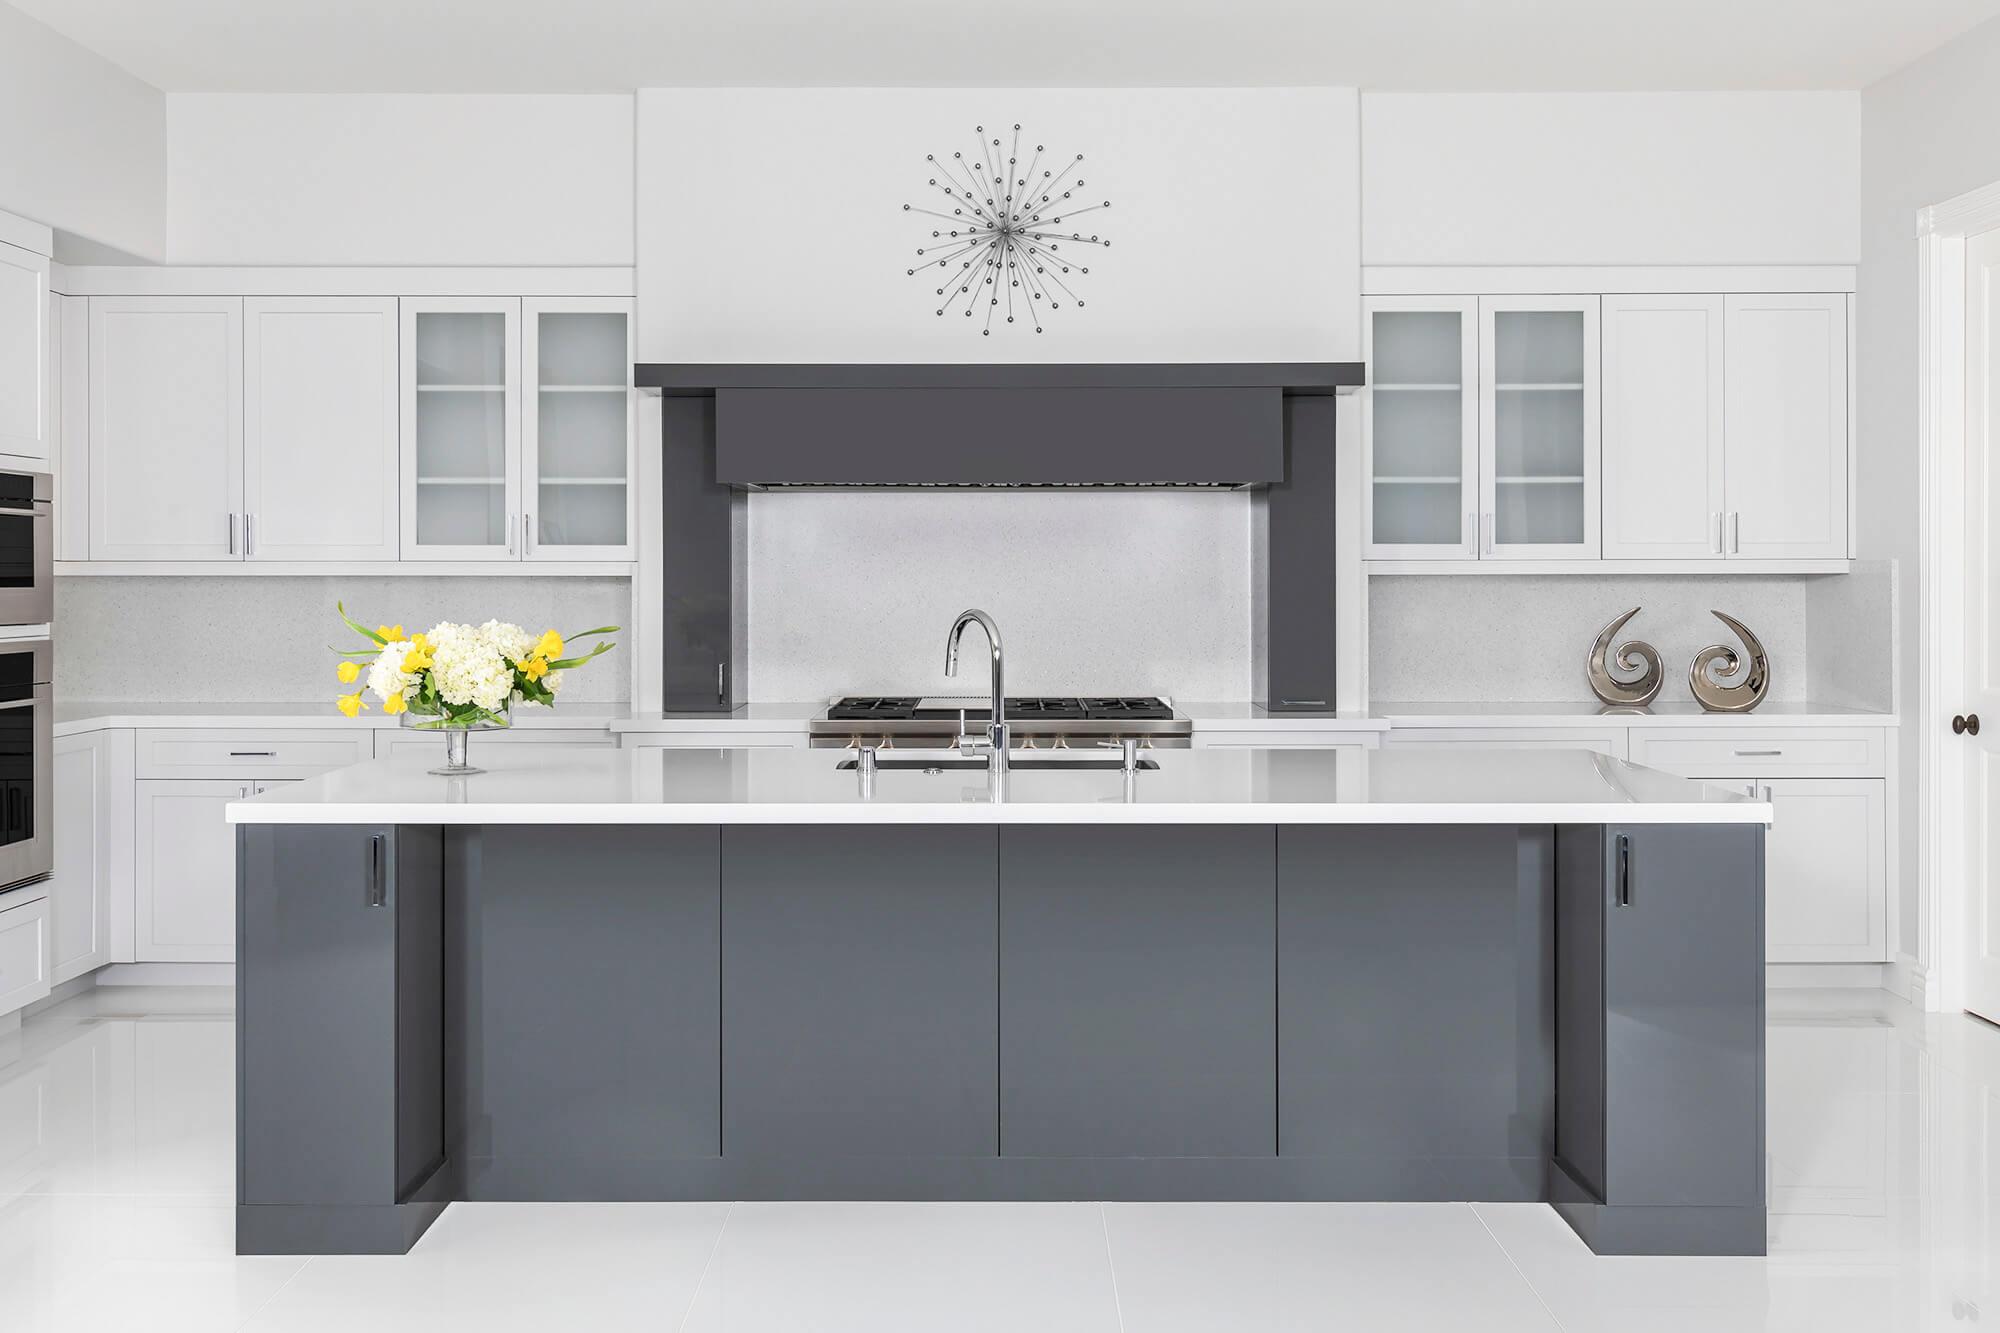 Charcoal-grey-modern-kitchen-design